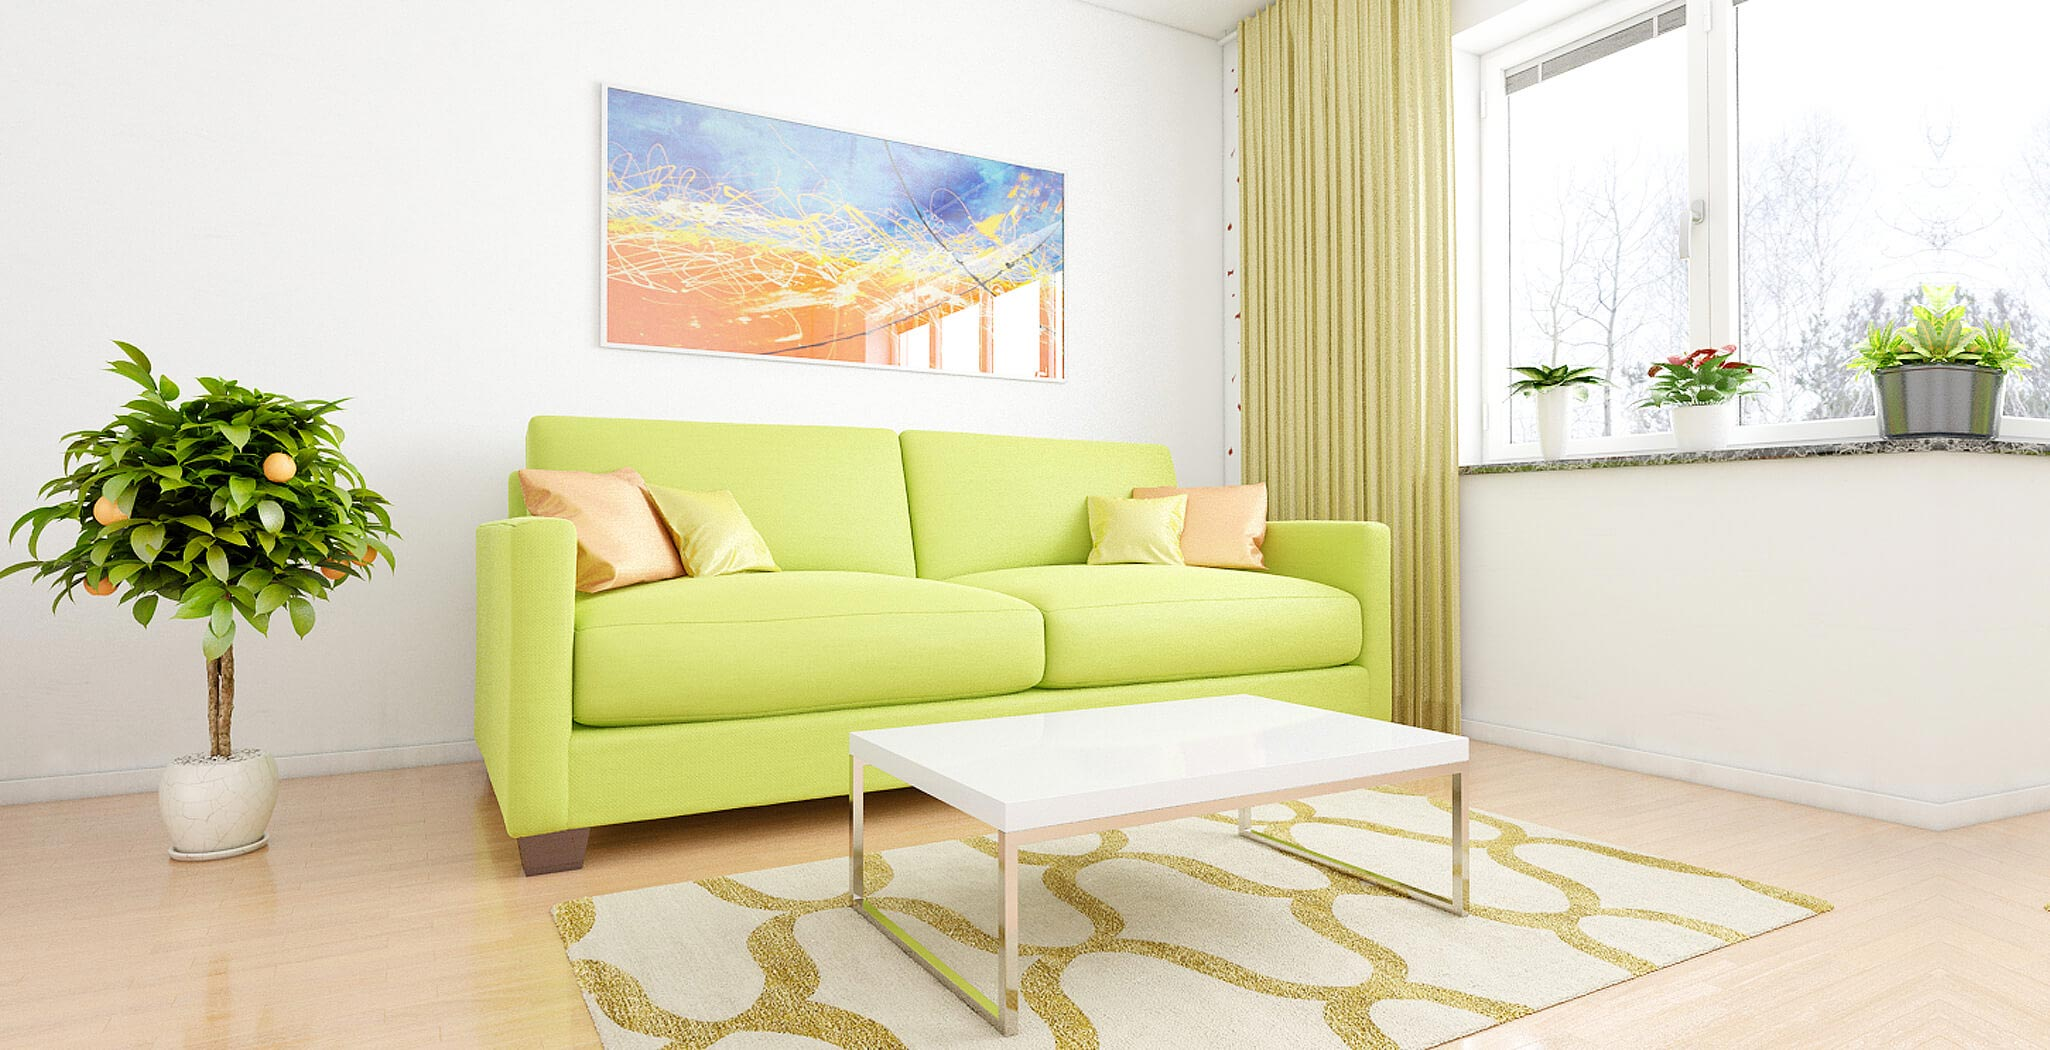 dresden sofa furniture gallery 3